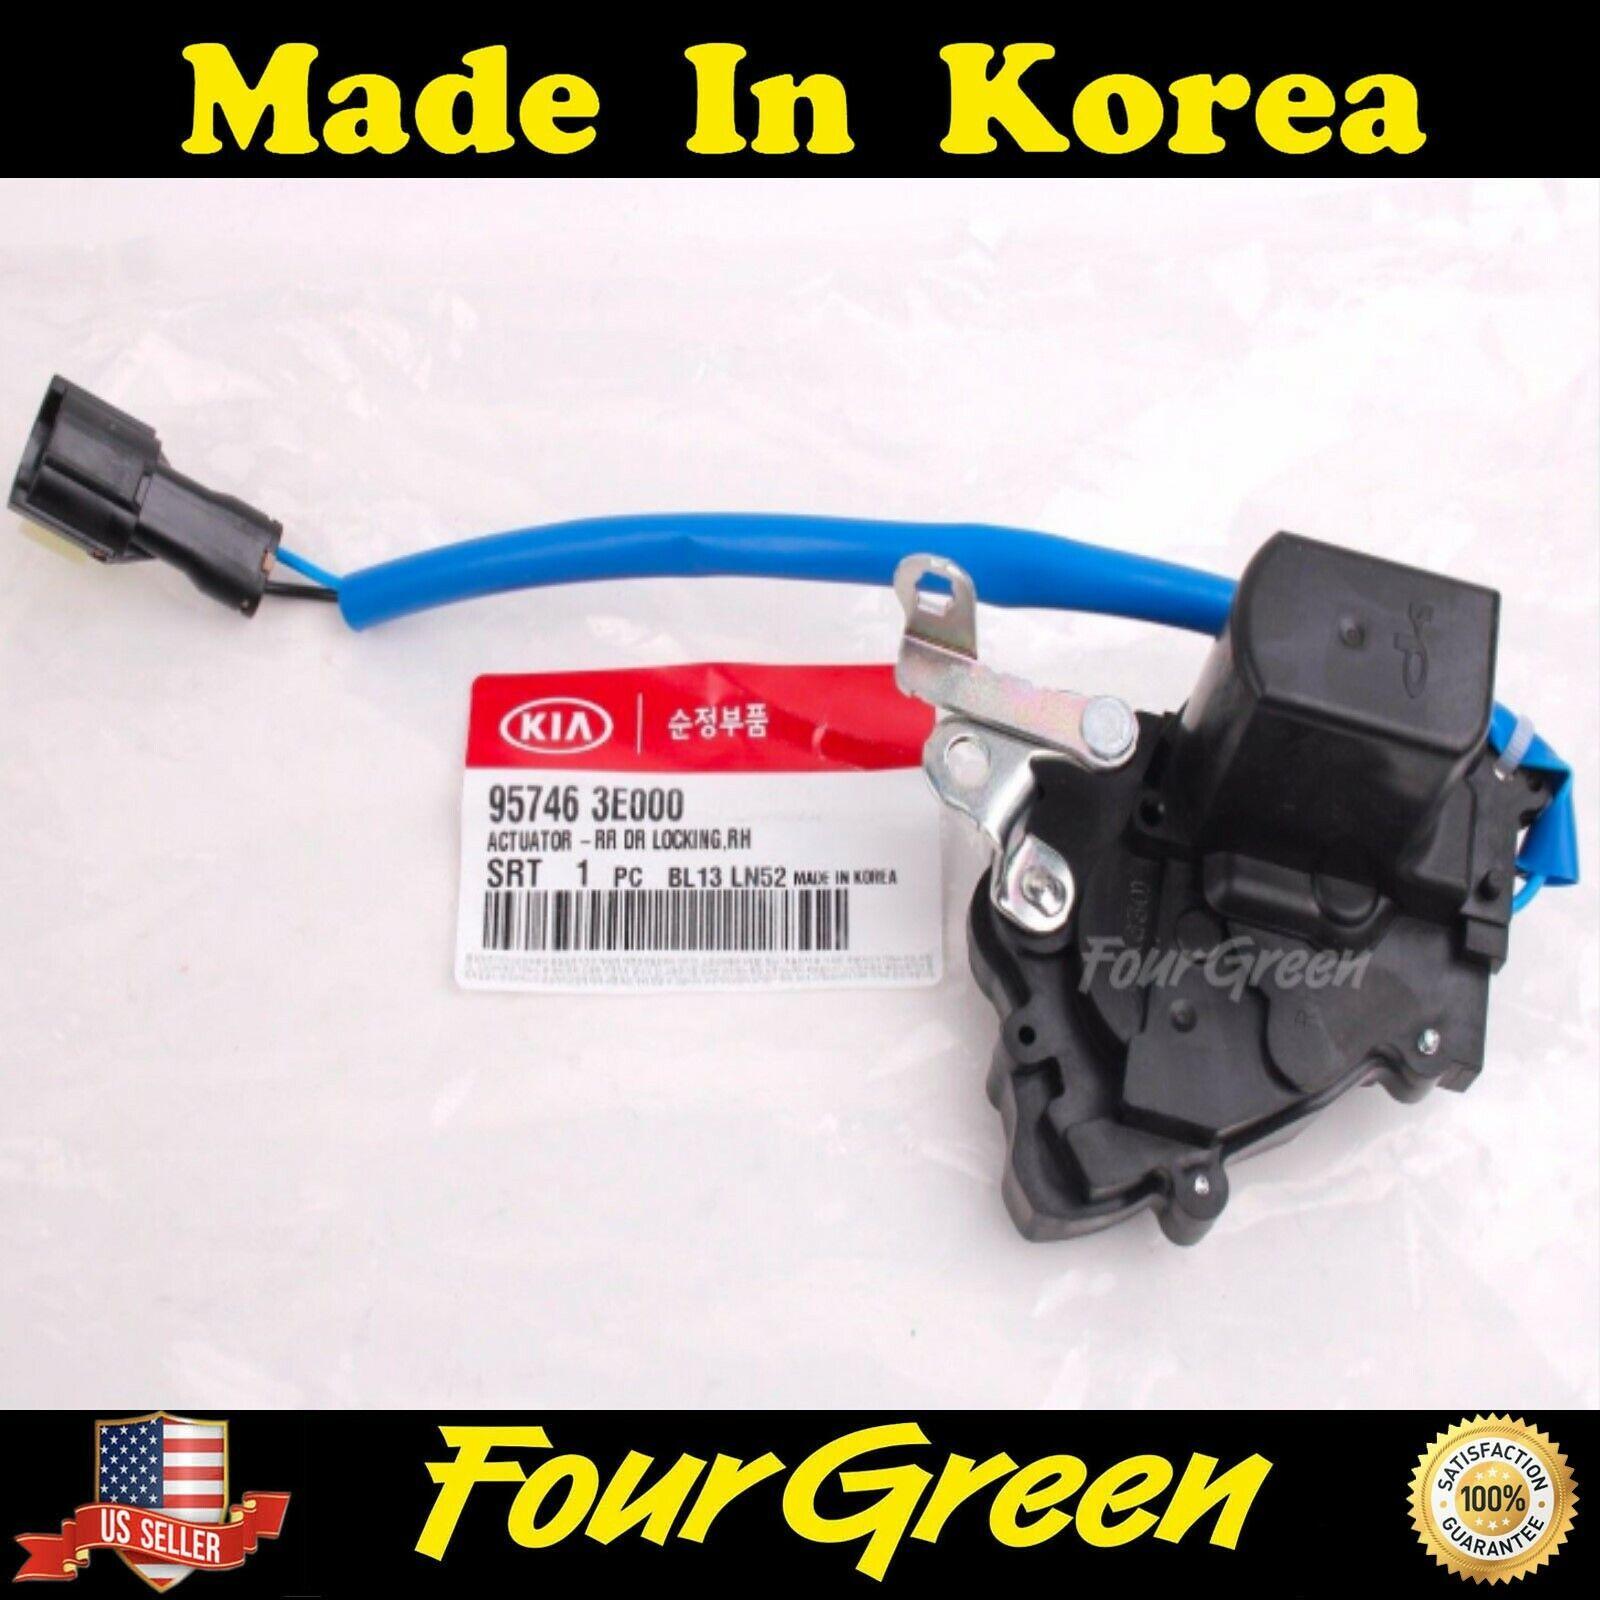 957463E000 Genuine Door Lock Actuator Rear Right for Kia 03-09 Sorento OEM